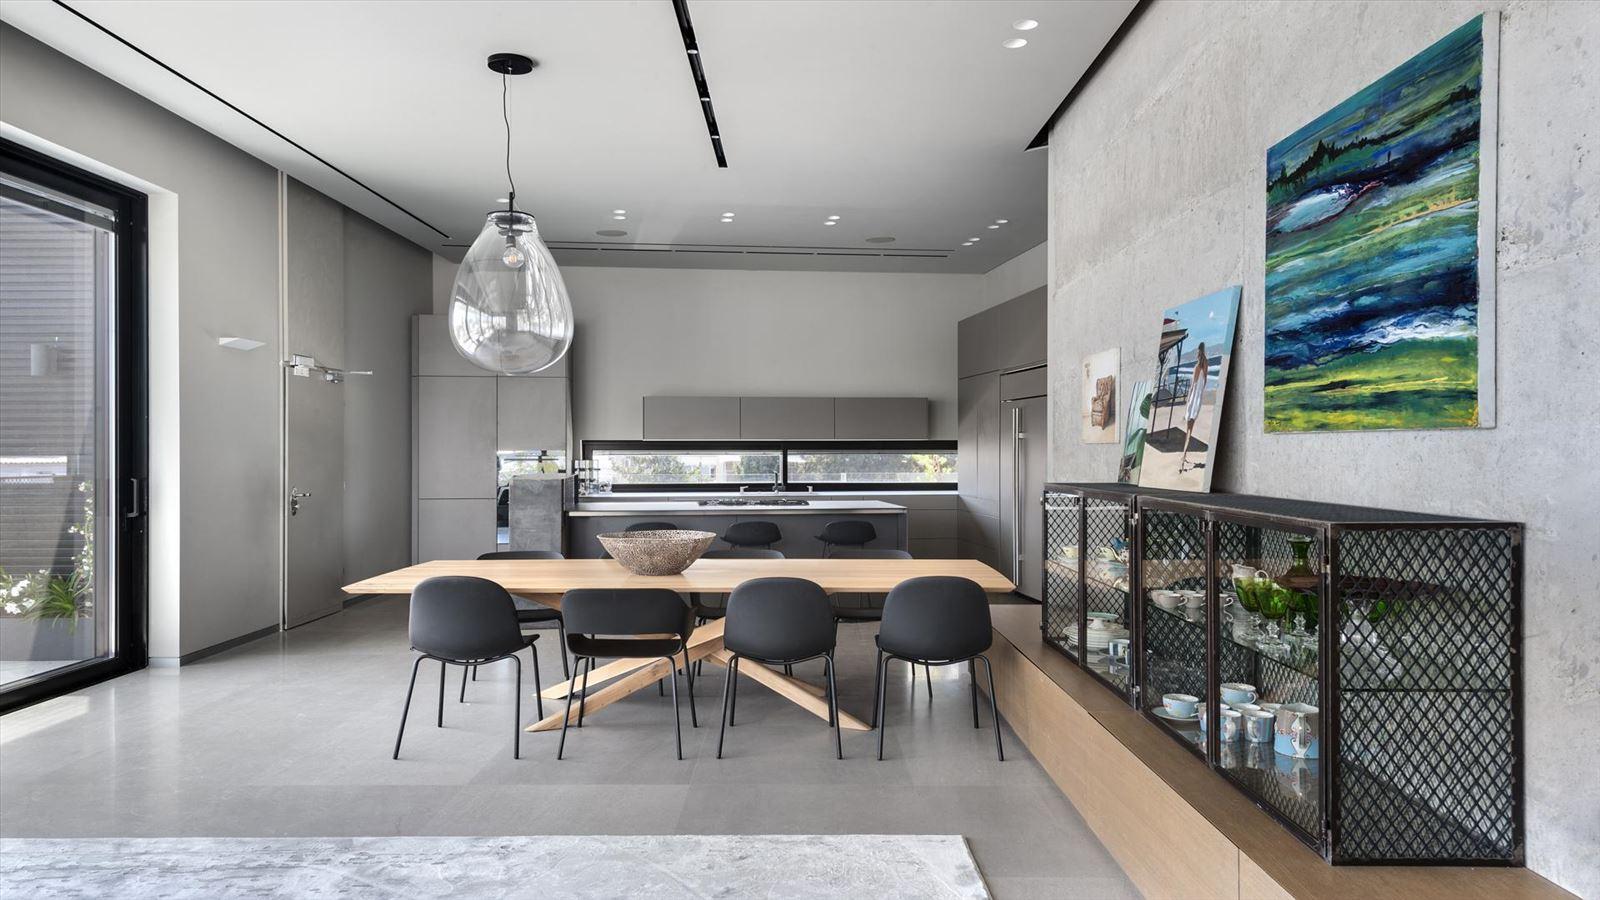 CENTRAL TLV LOFT מבט על גופי תאורה במטבח נעשה על ידי קמחי תאורה